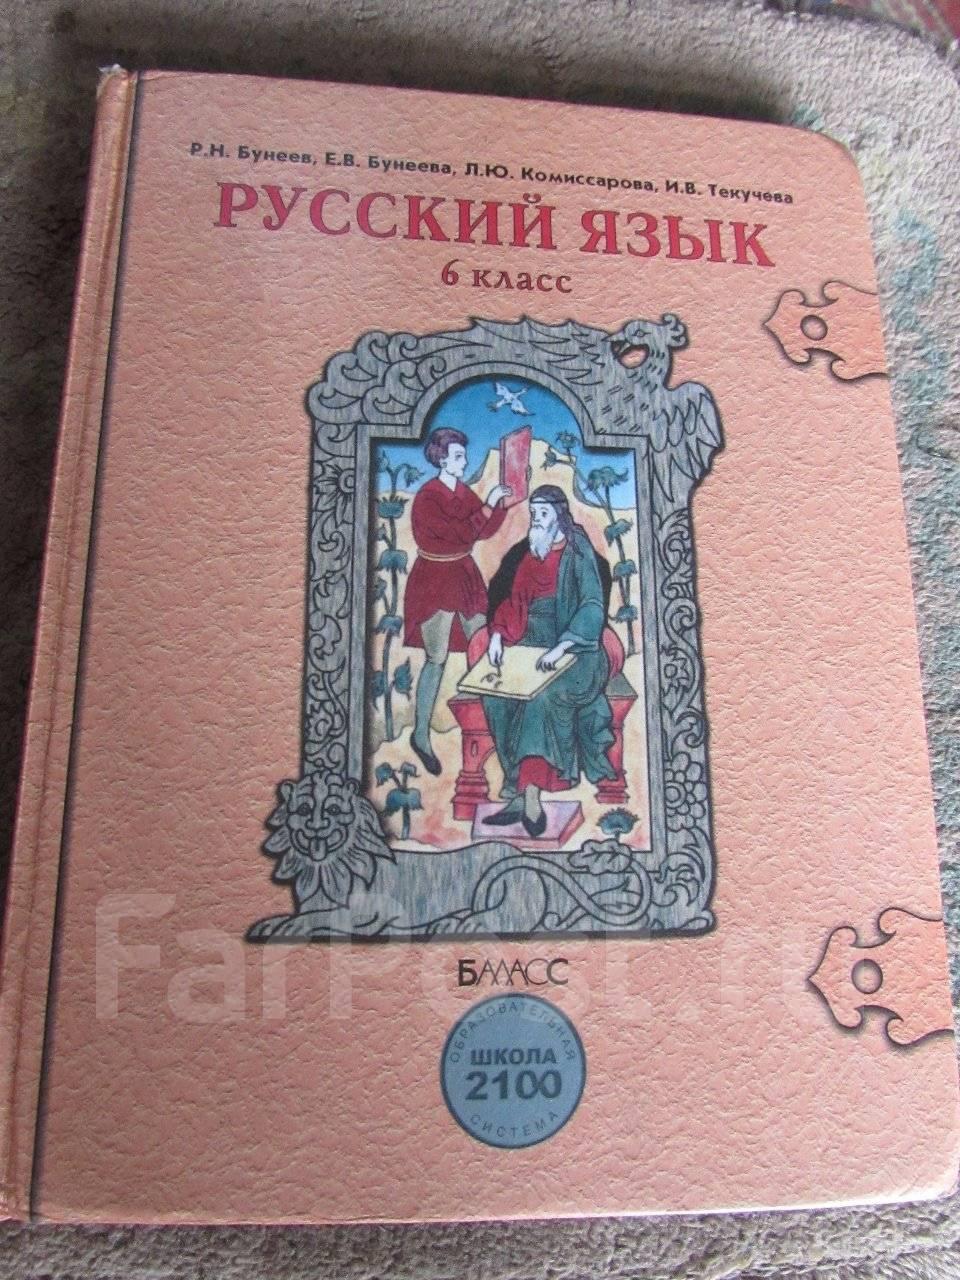 Учебник русского языка 6 класс бунеев.р.н